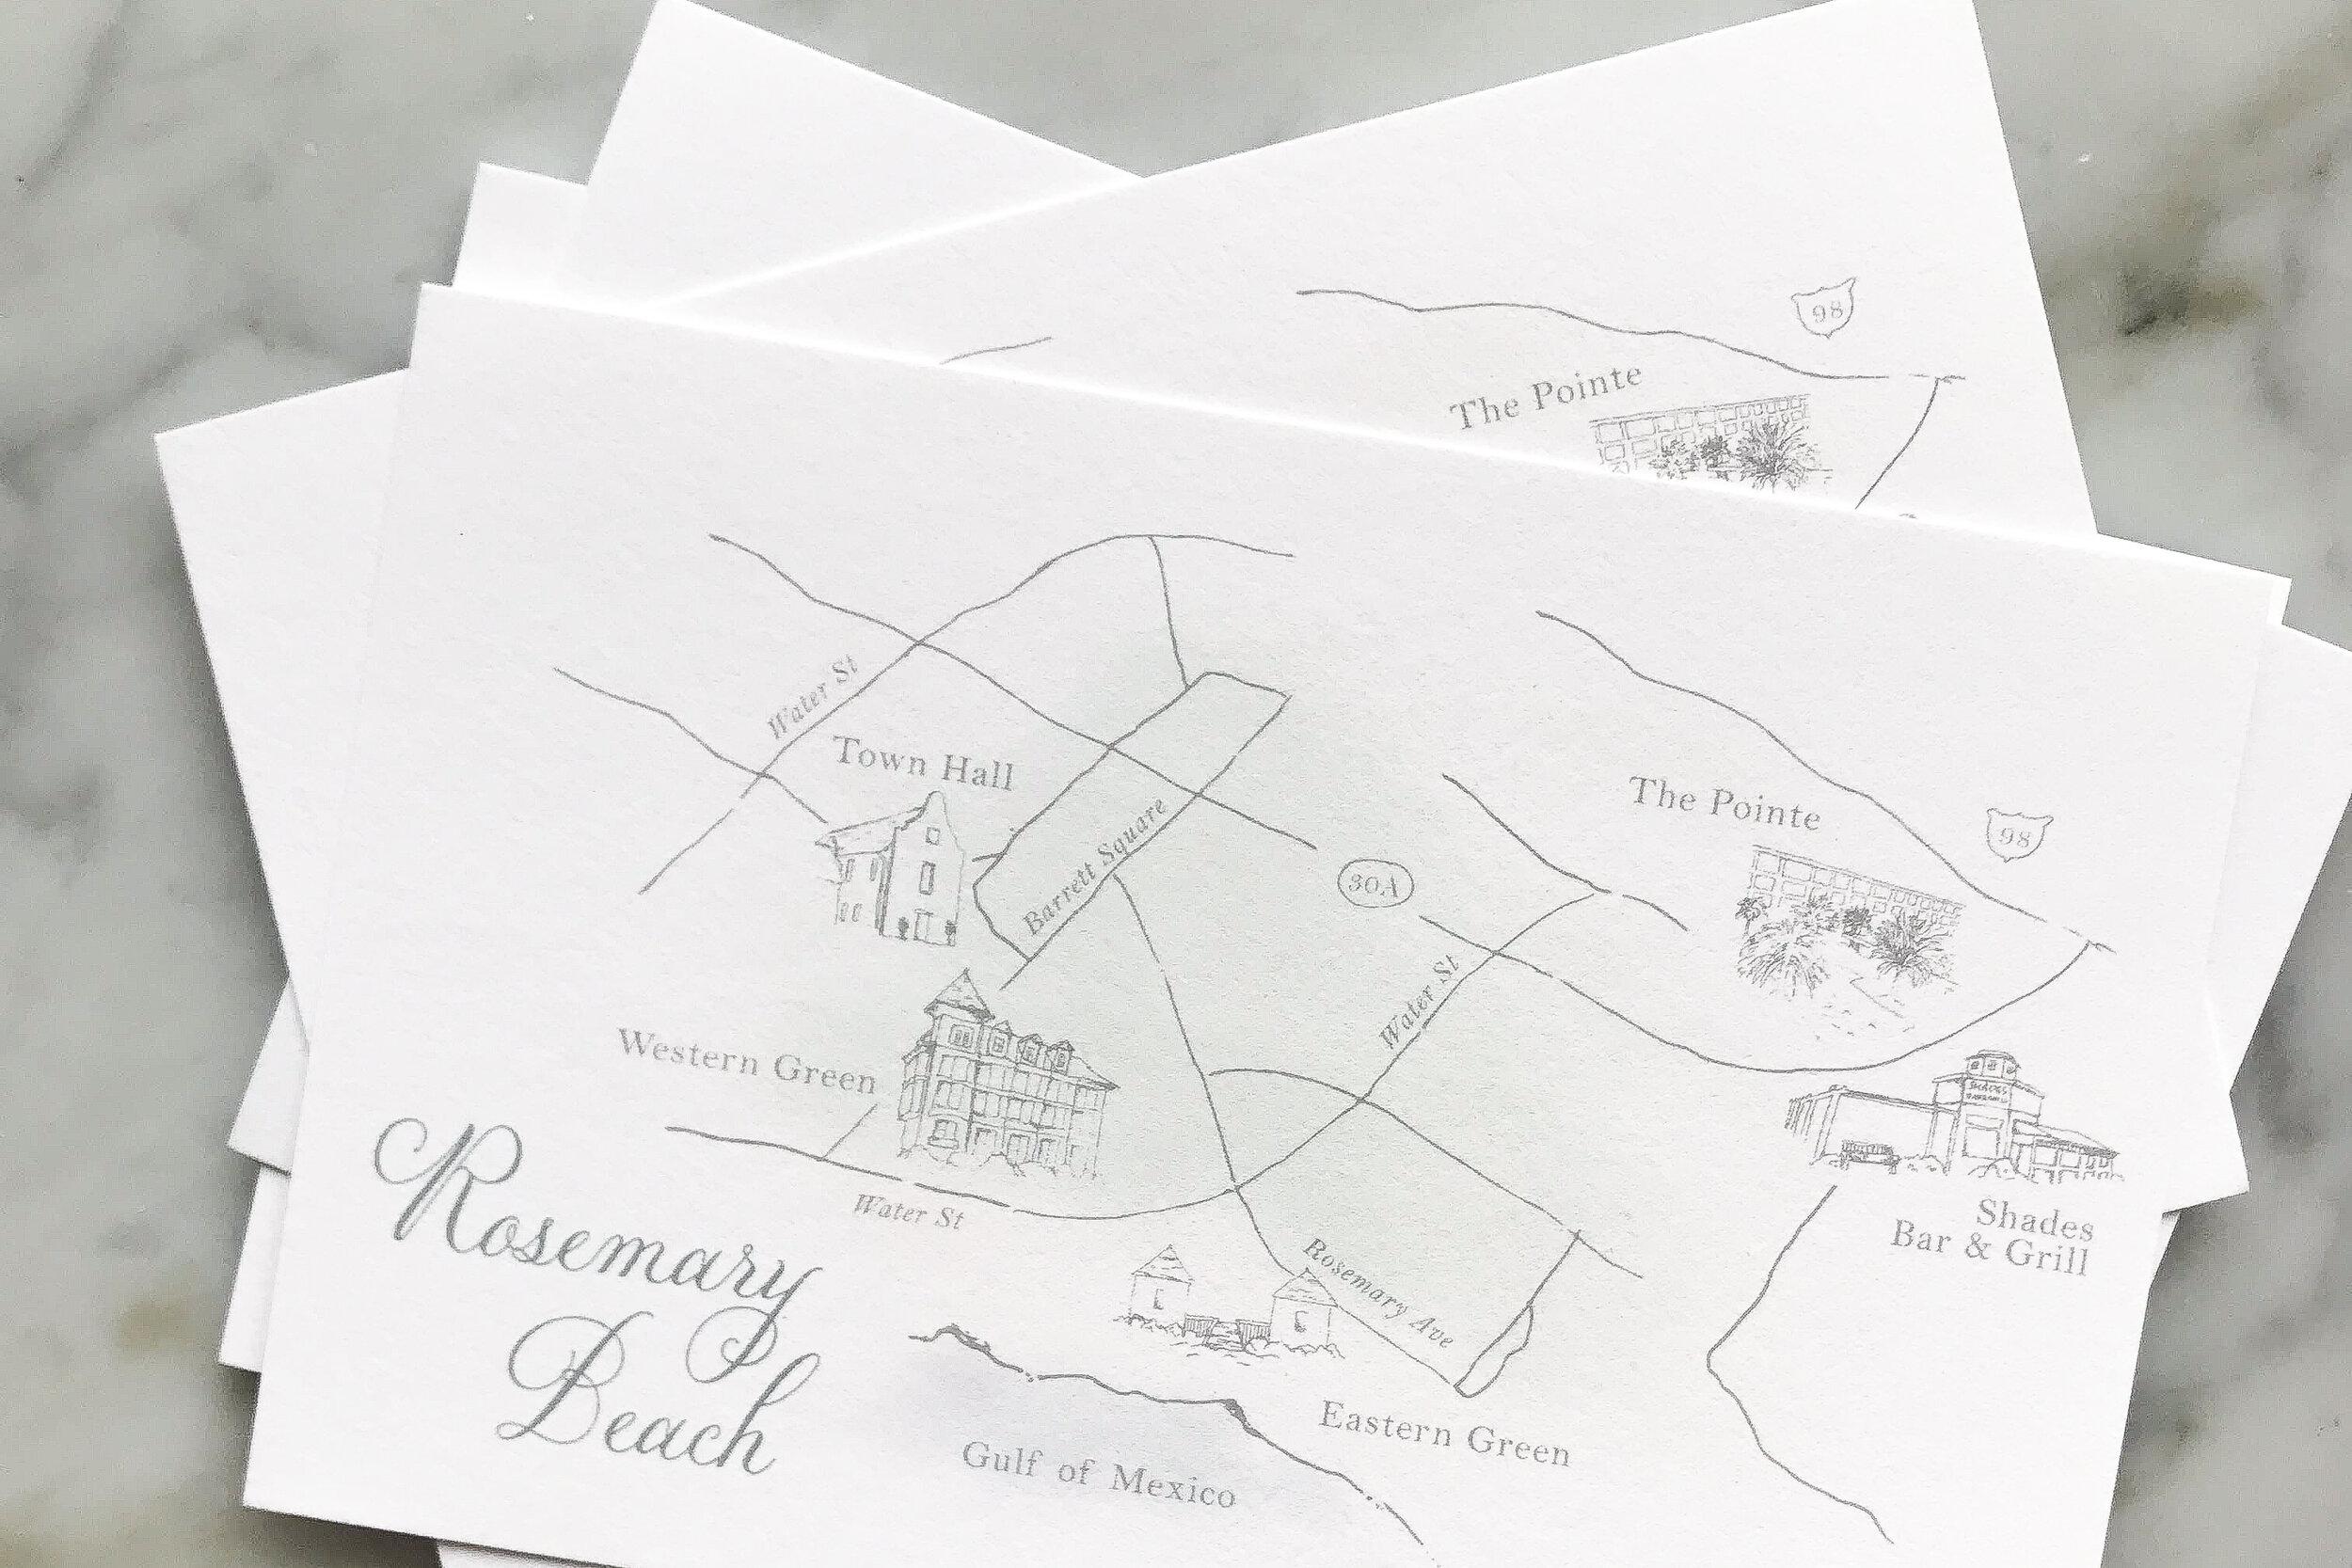 Rosemary Beach Wedding Invitation Map